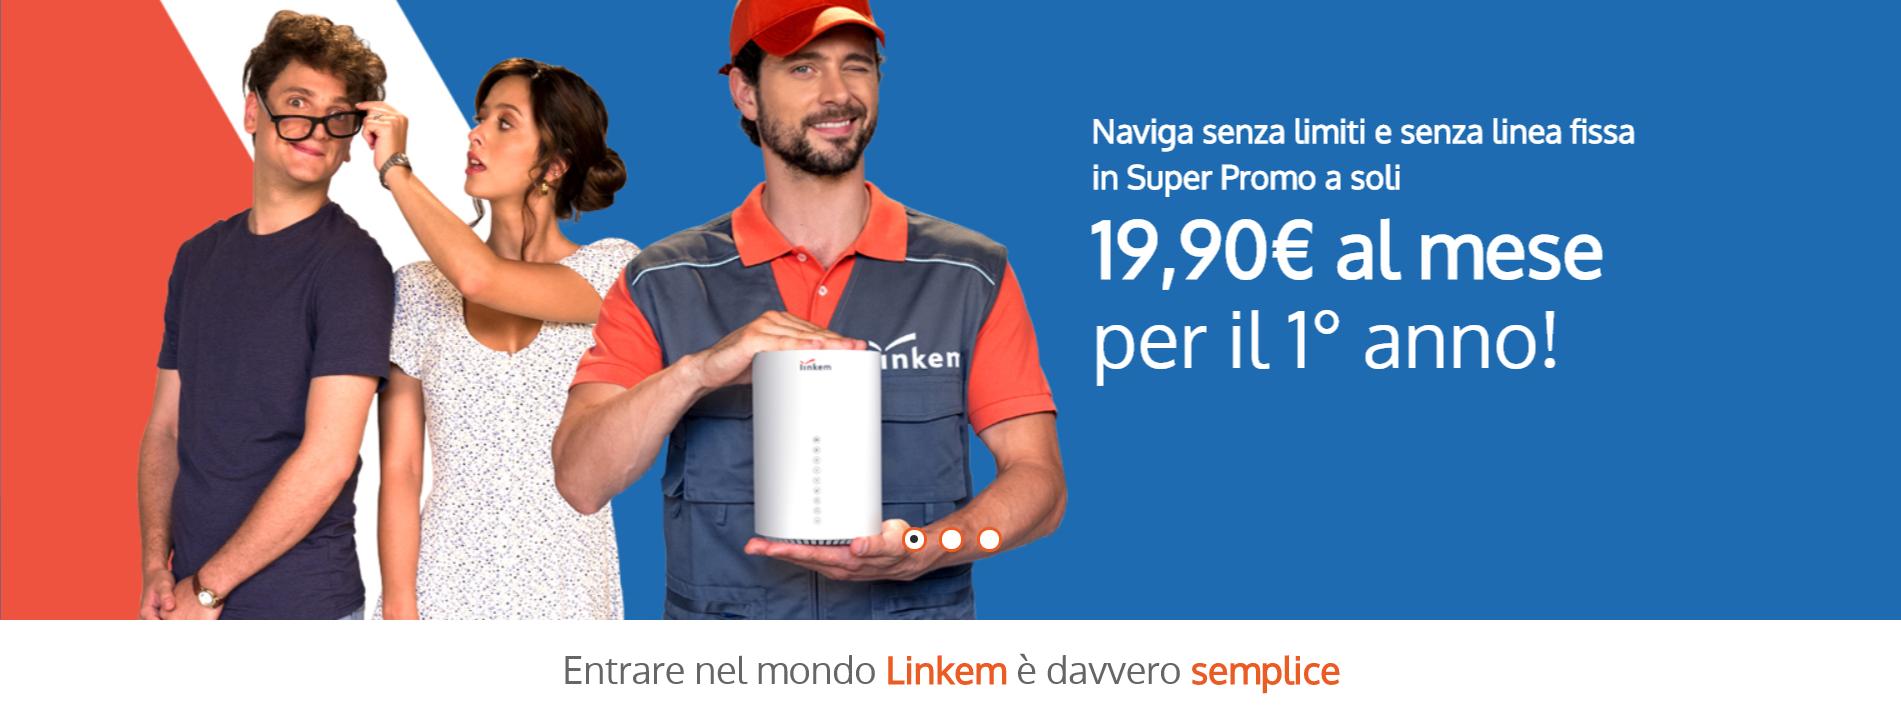 screenshot web.linkem.com 2019.09.16 15 59 17